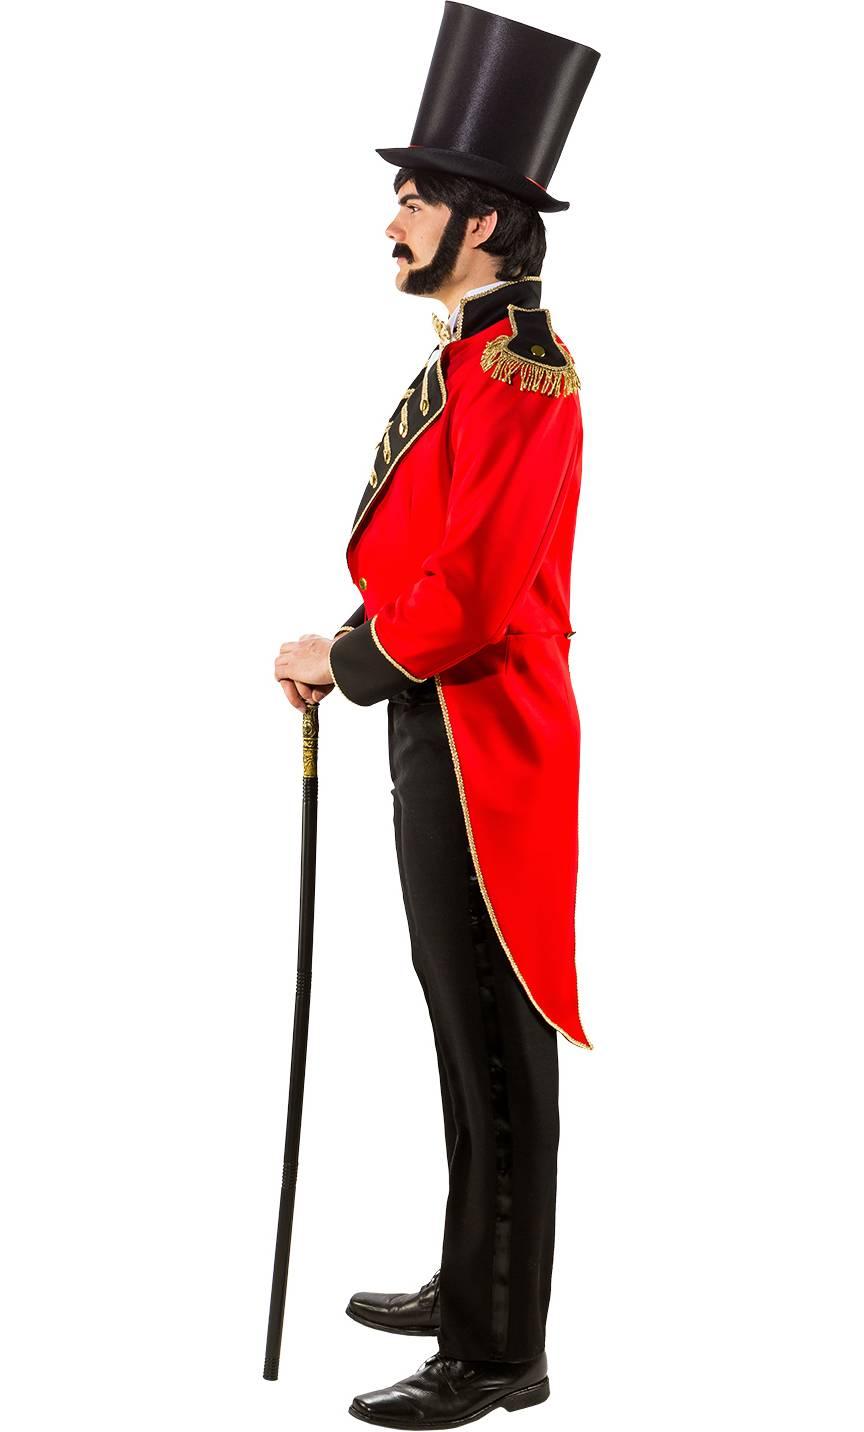 Costume-Monsieur-Loyal-Homme-XL-2